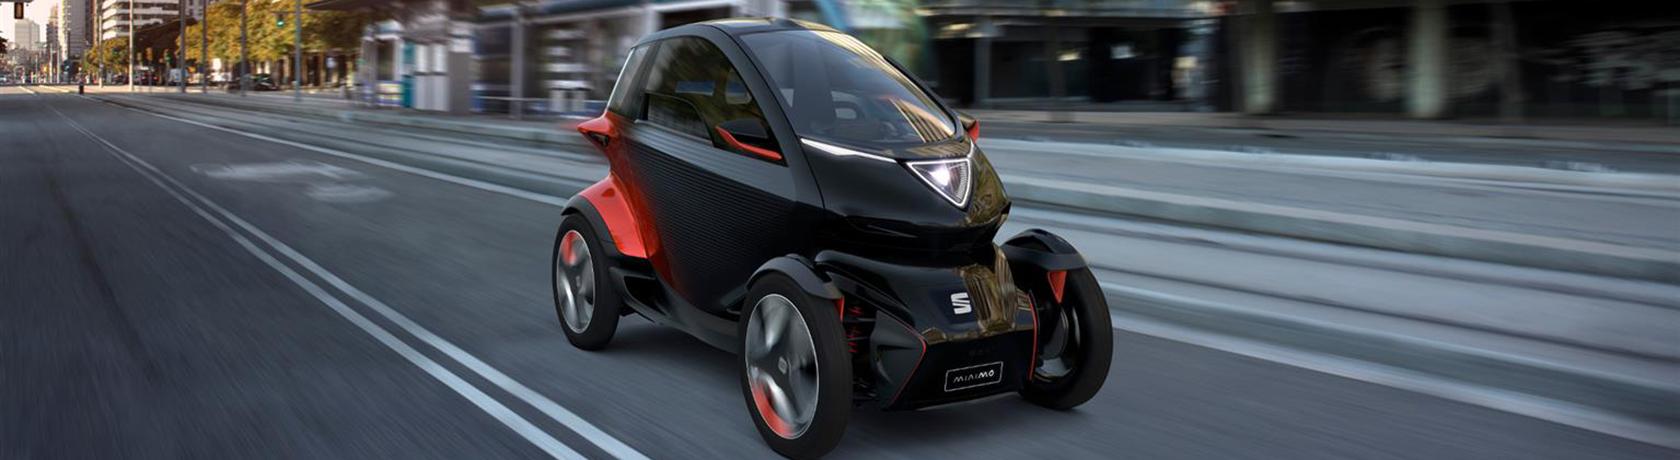 Minimó, la micromobilità urbana secondo SEAT